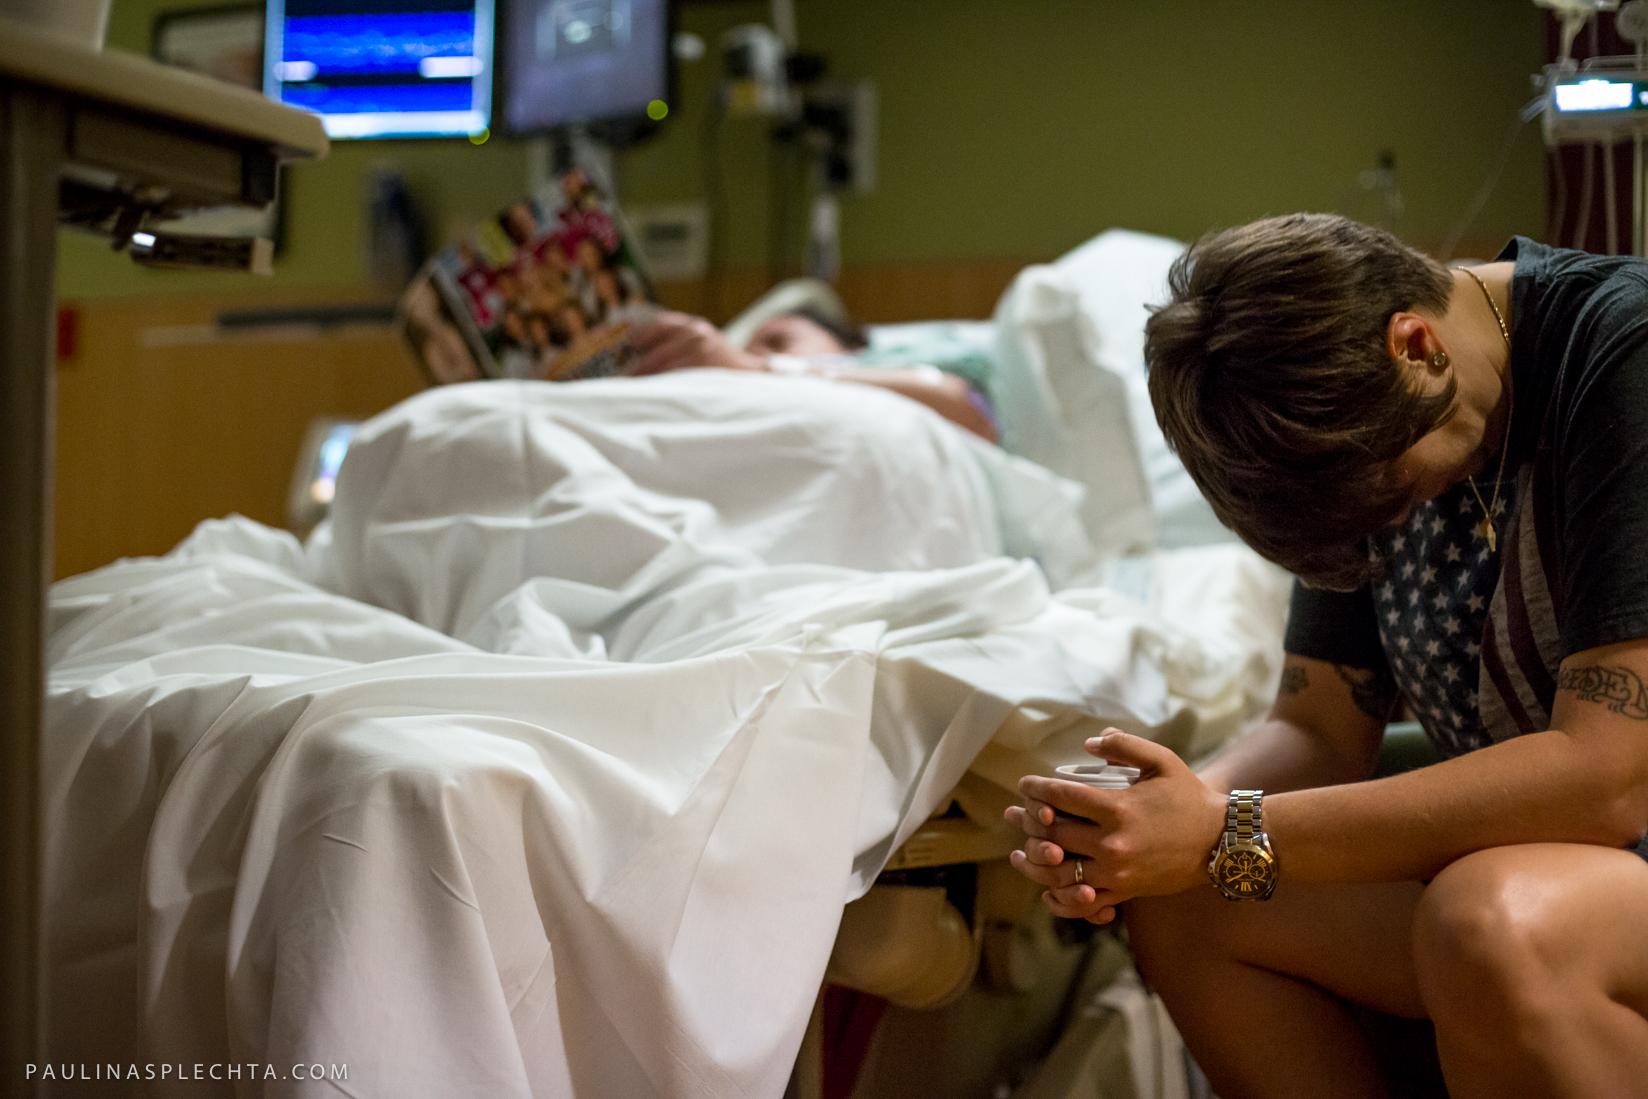 memorial-regional-hospital-hollywood-birth-photographer-miramar-pembroke-pines-miami-boca-raton-regional-pediatrician-broward-palm-beach-hurricane-matthew-6.jpg